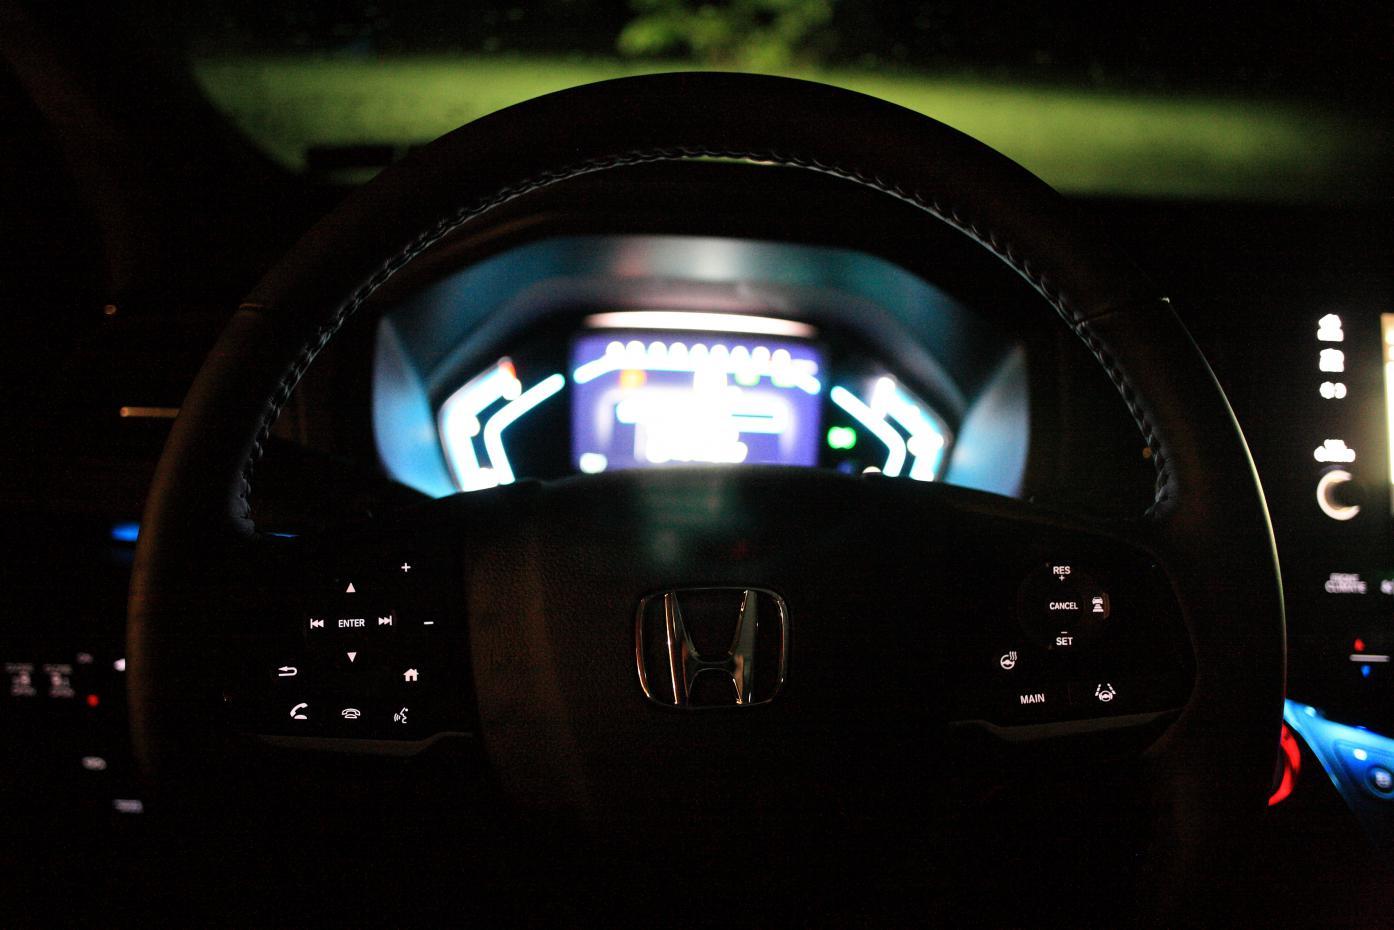 Panel and Button Lighting when Using Headlights-img_2345.jpg